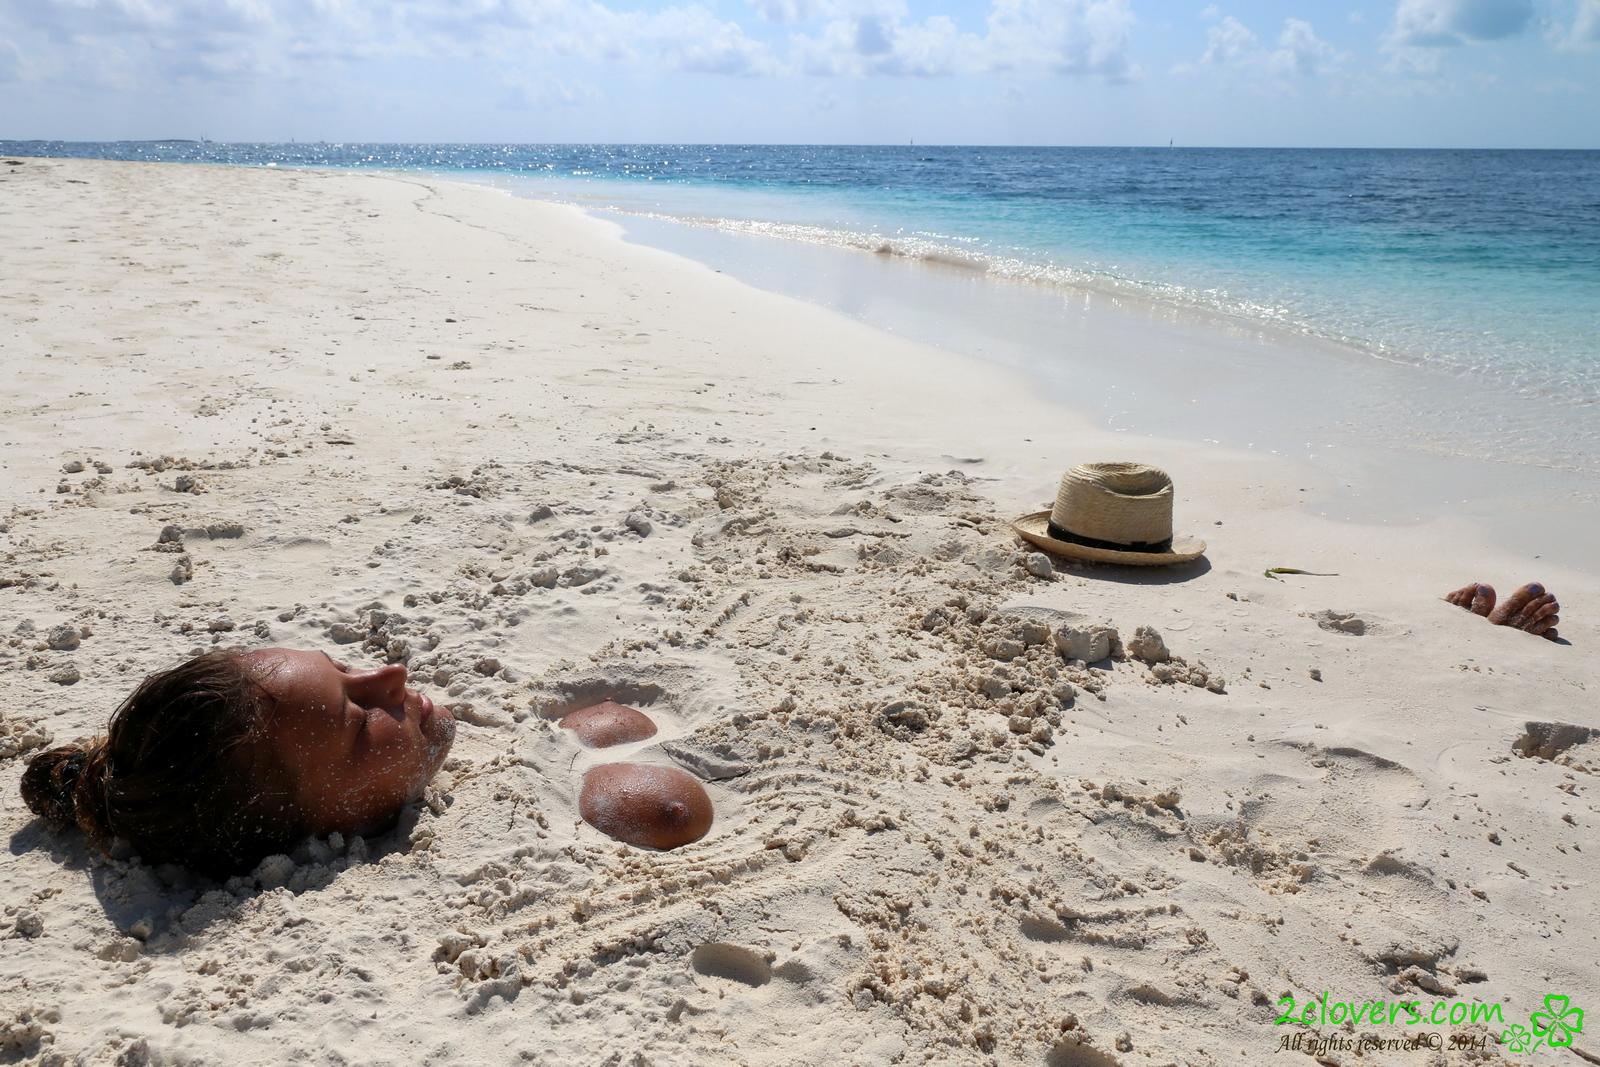 katya-clover-naked-on-sirena-beach-seaside-2clovers-38